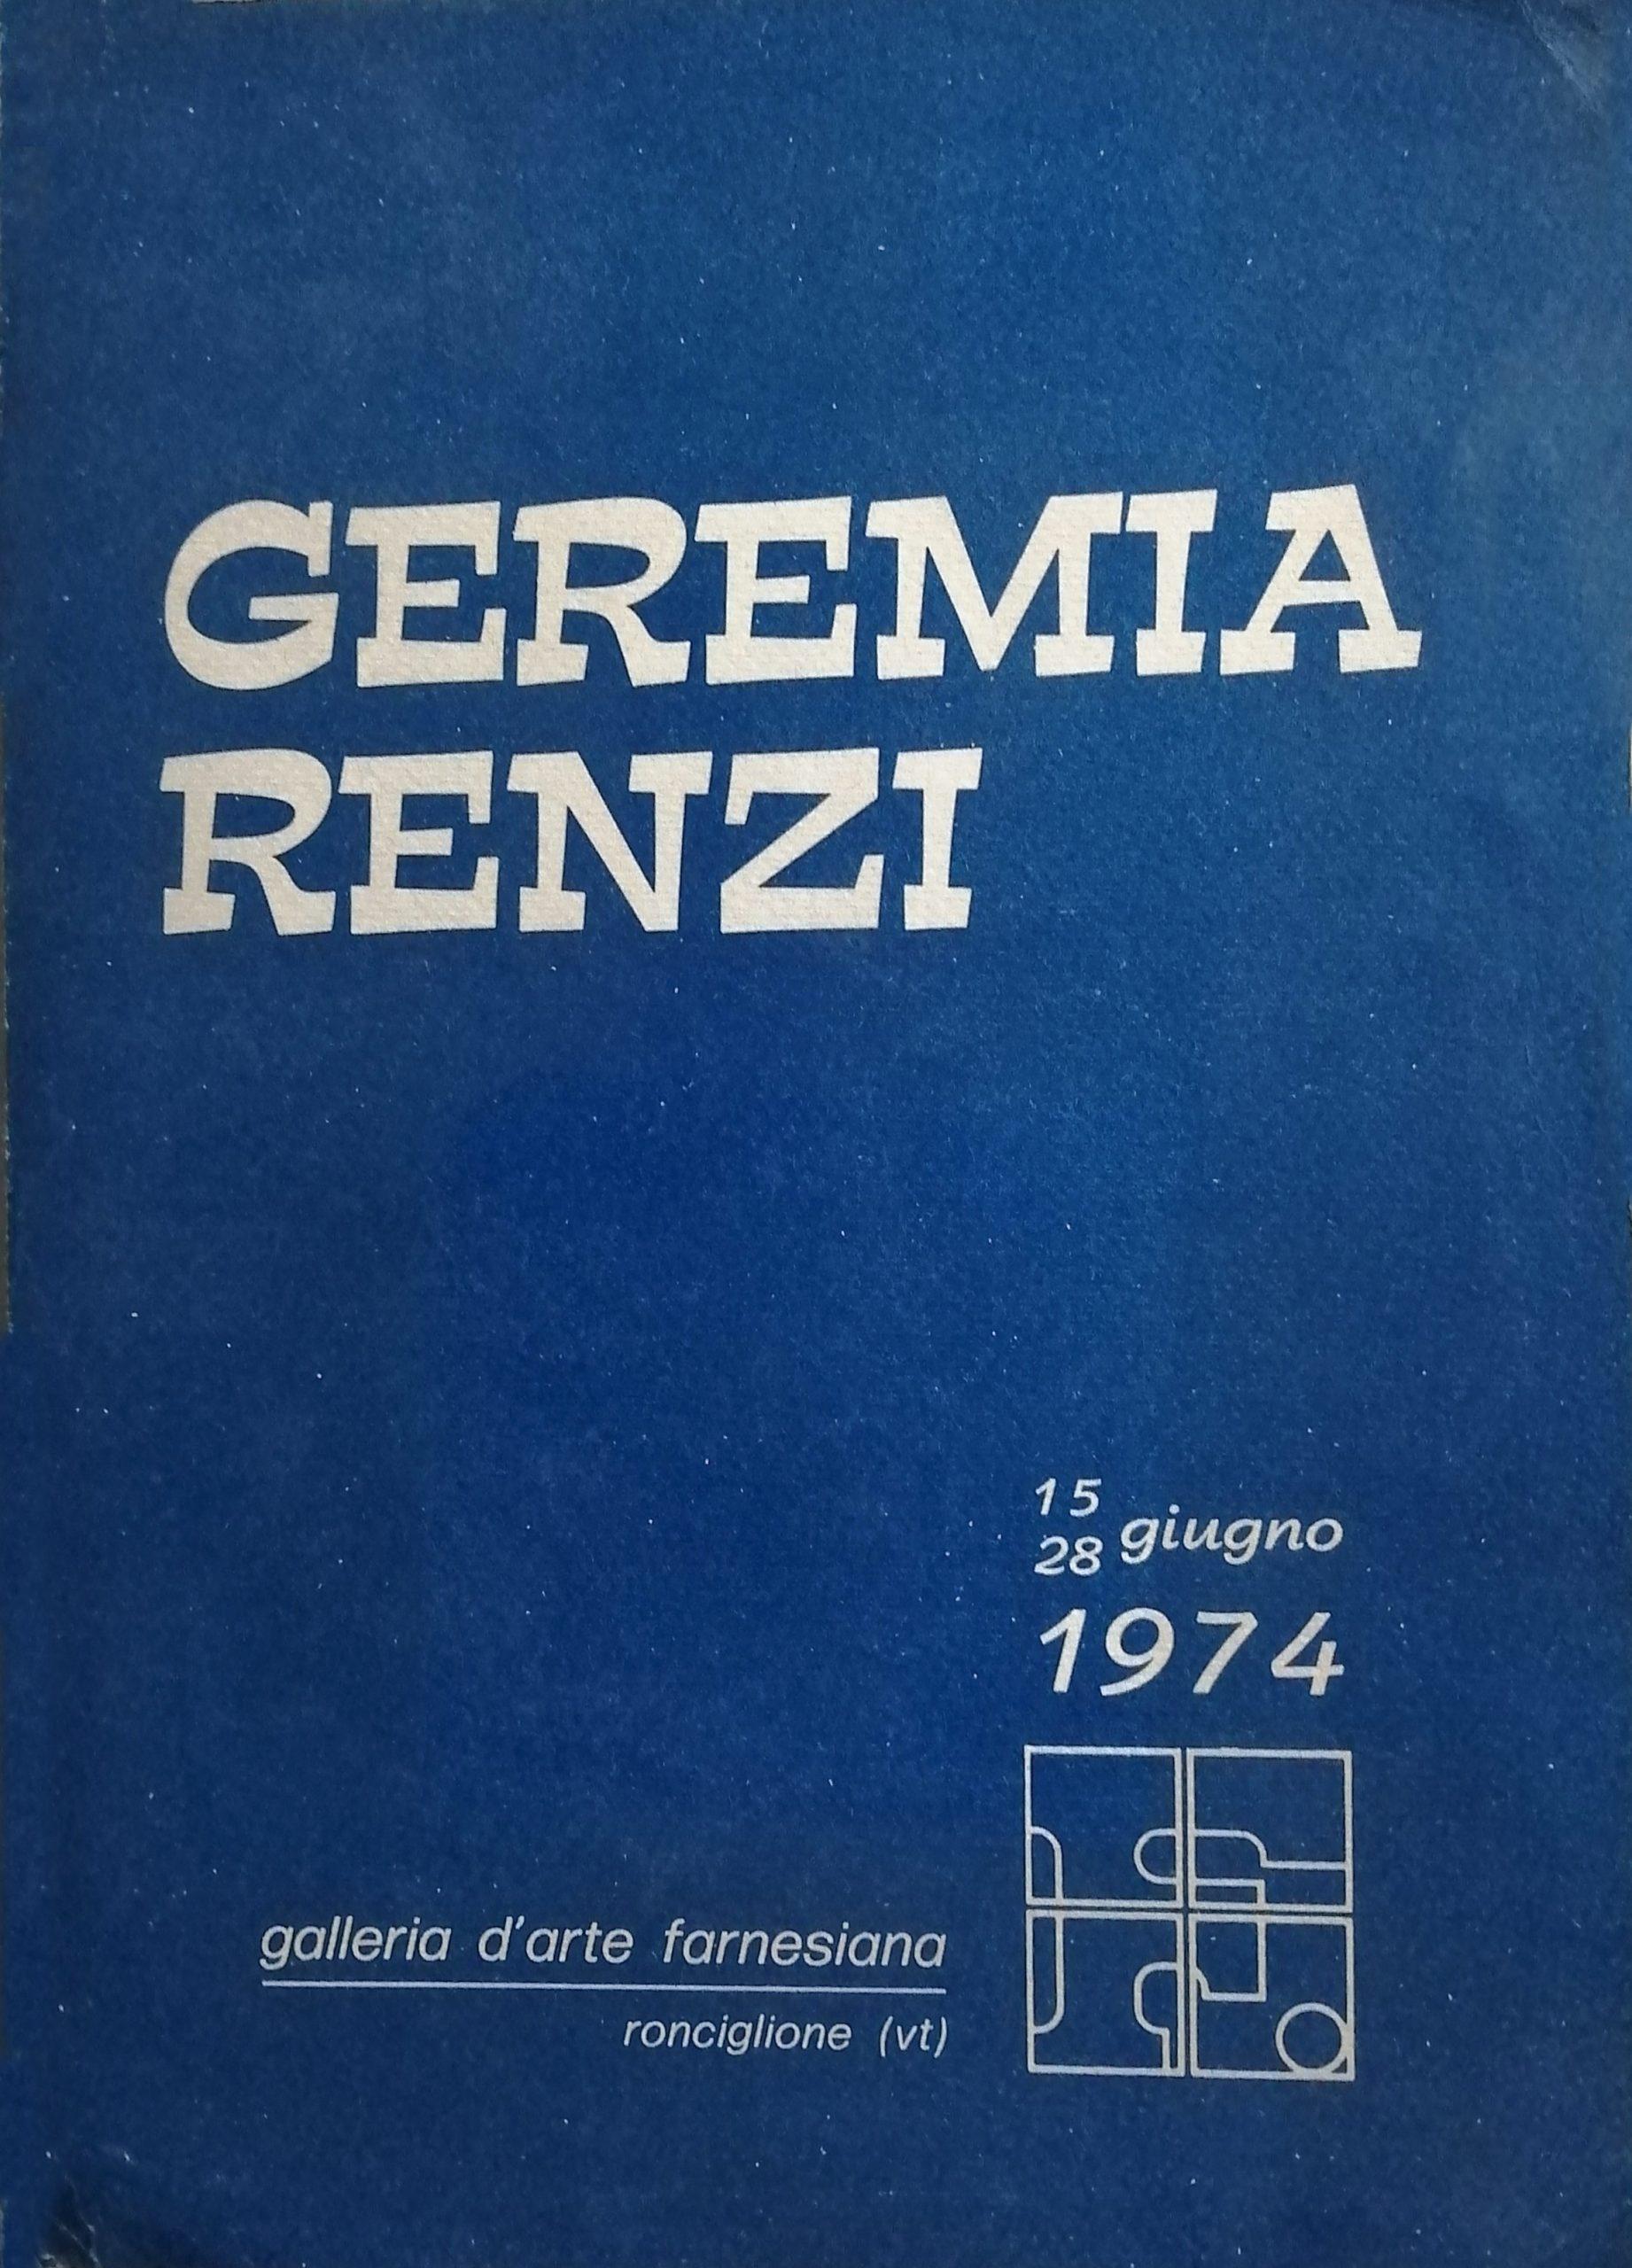 1974 Geremia Renzi Galleria dArte Farnesiana Ronciglione scaled - Bibliography/ Catalogues